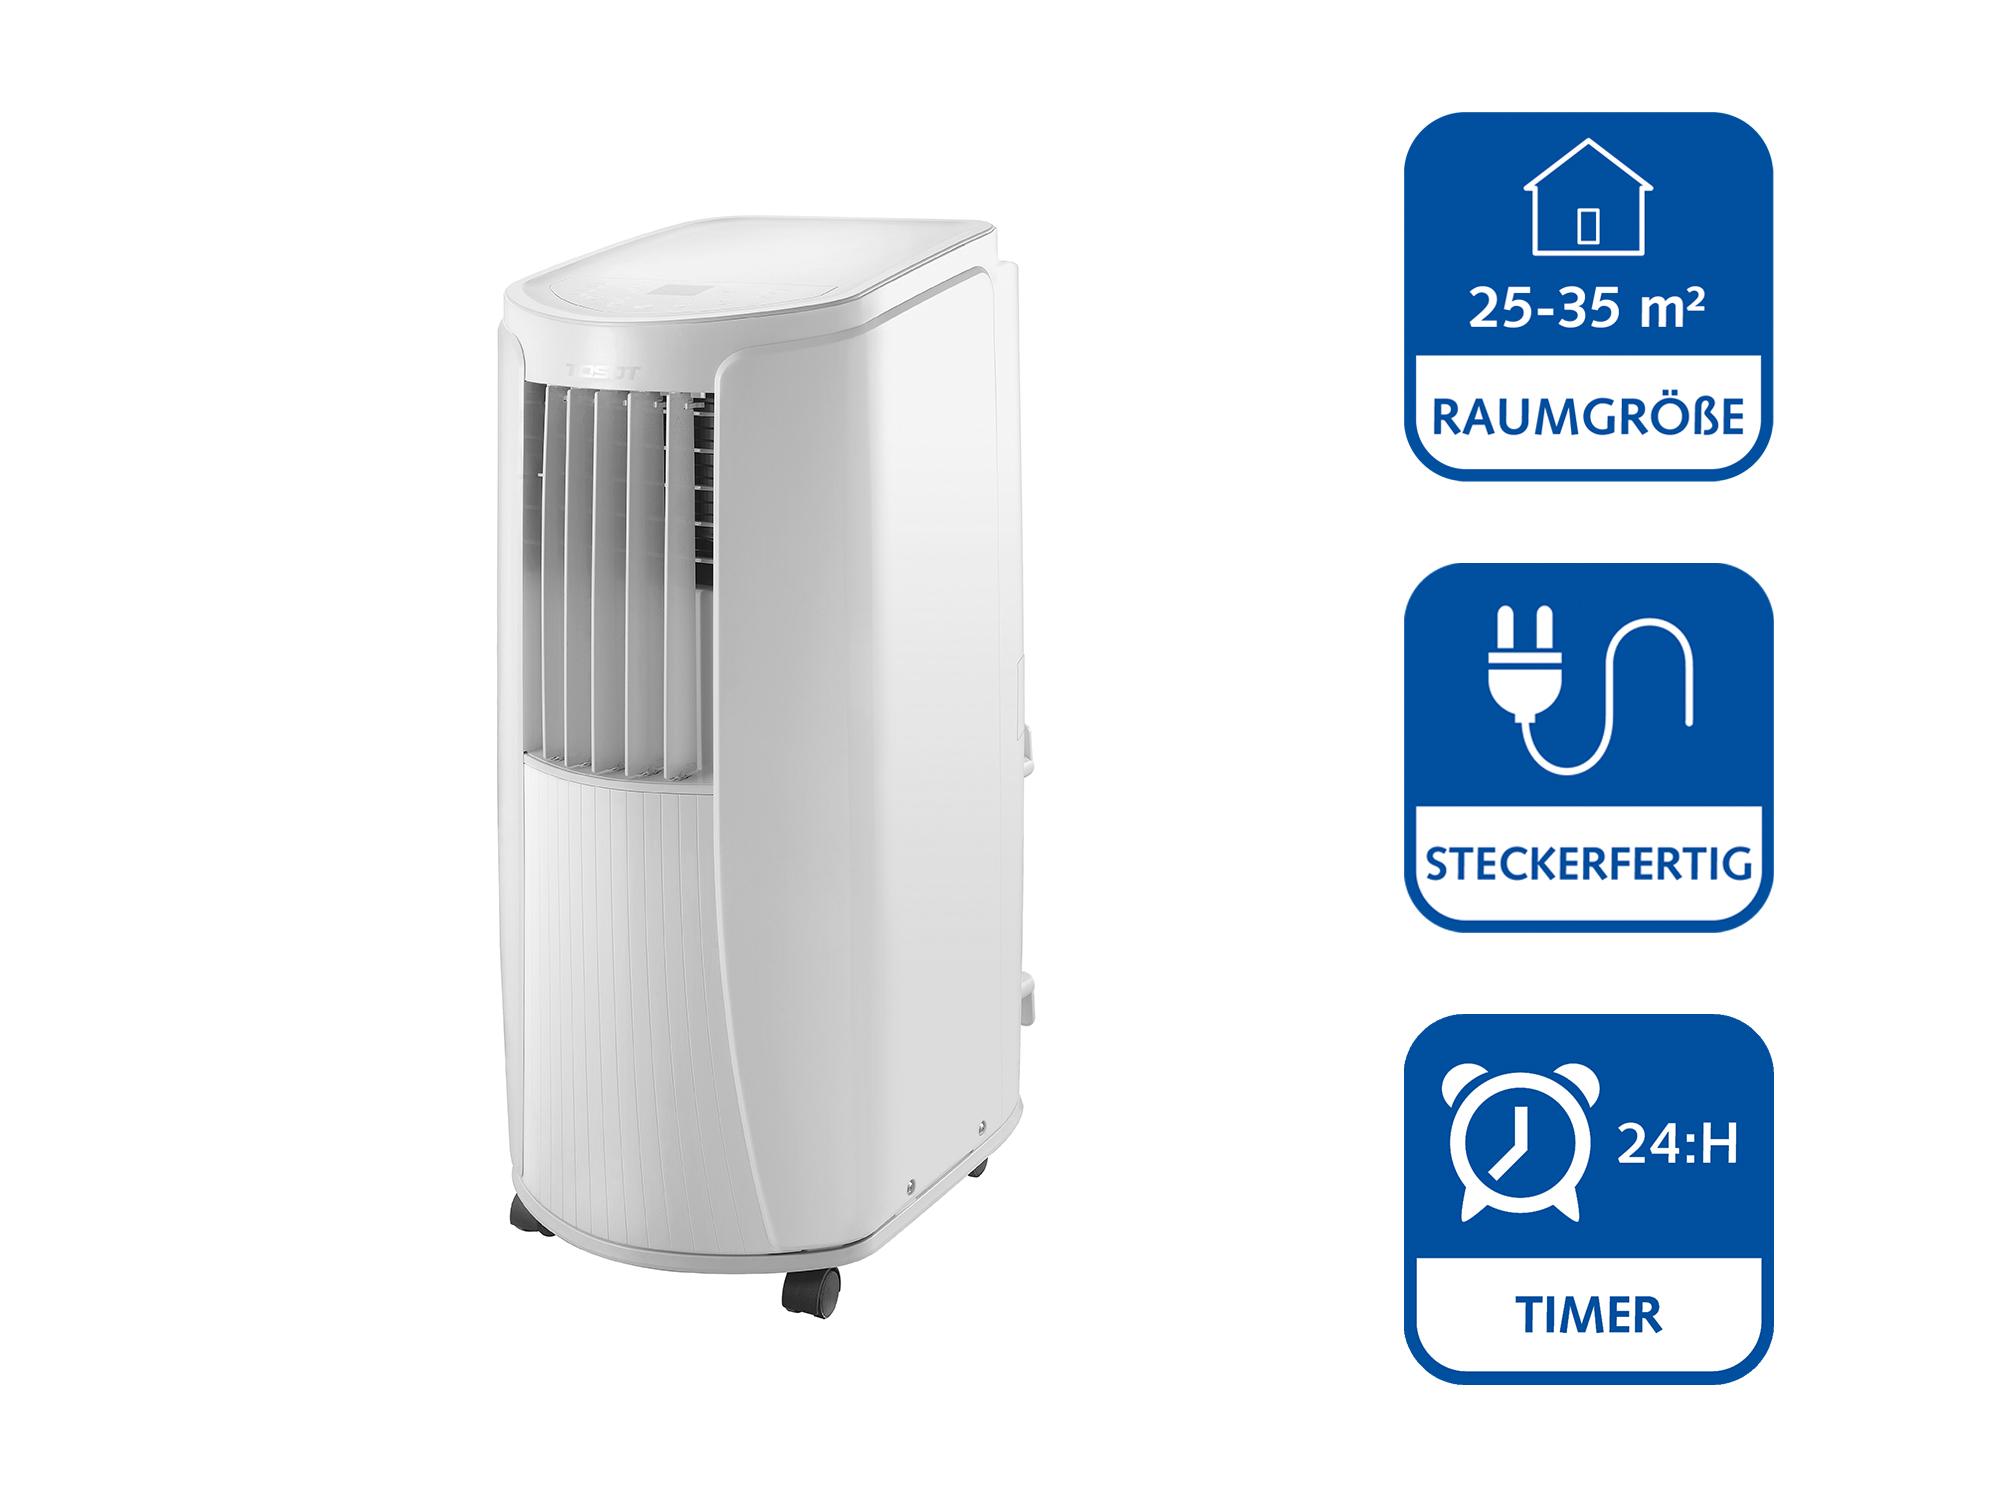 mobilie-klimaanlage-mit-icons